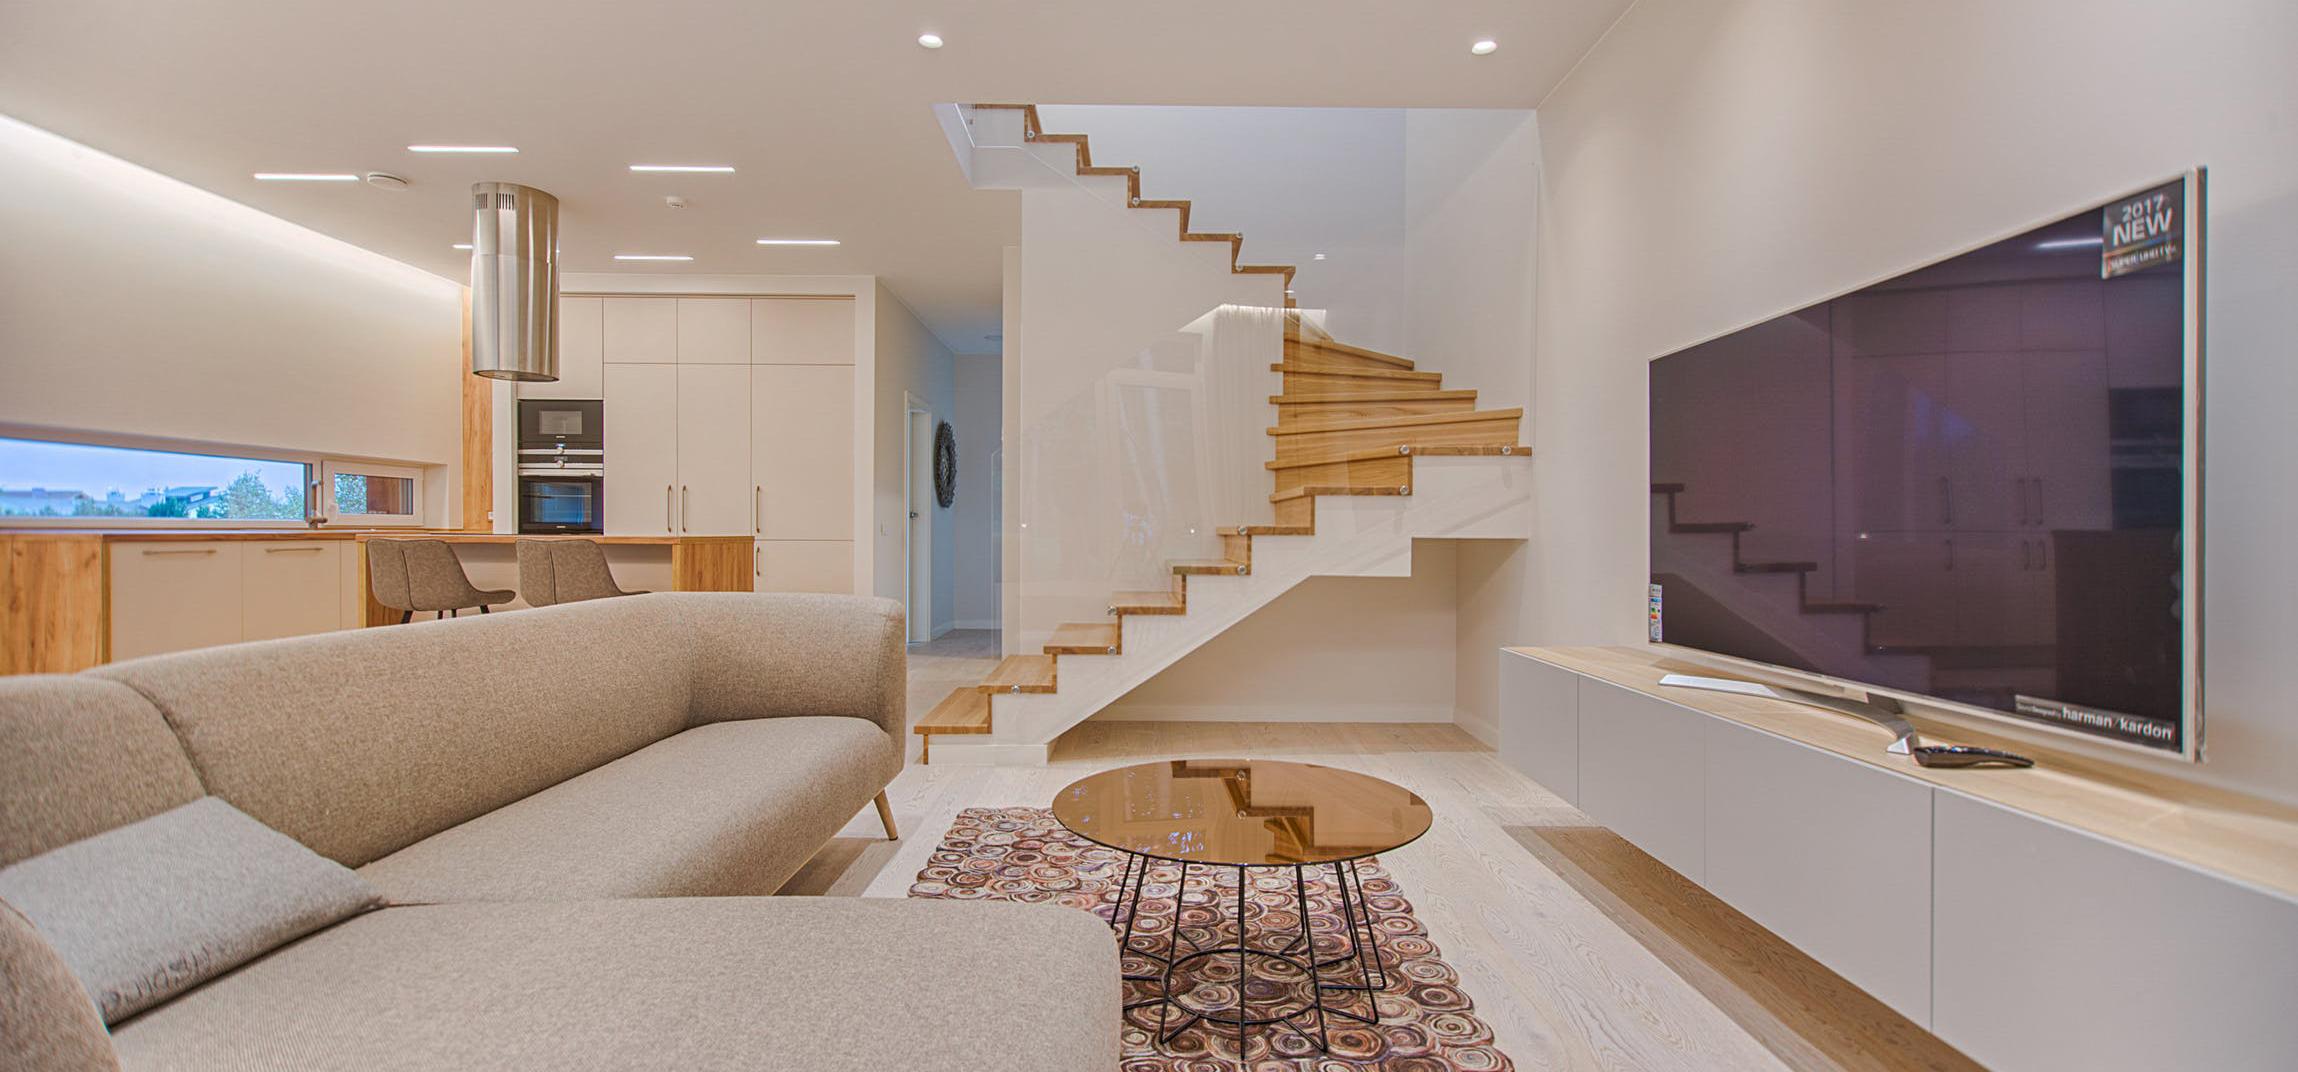 best-lighting-features-to-lighten-up-your-home-8.jpeg